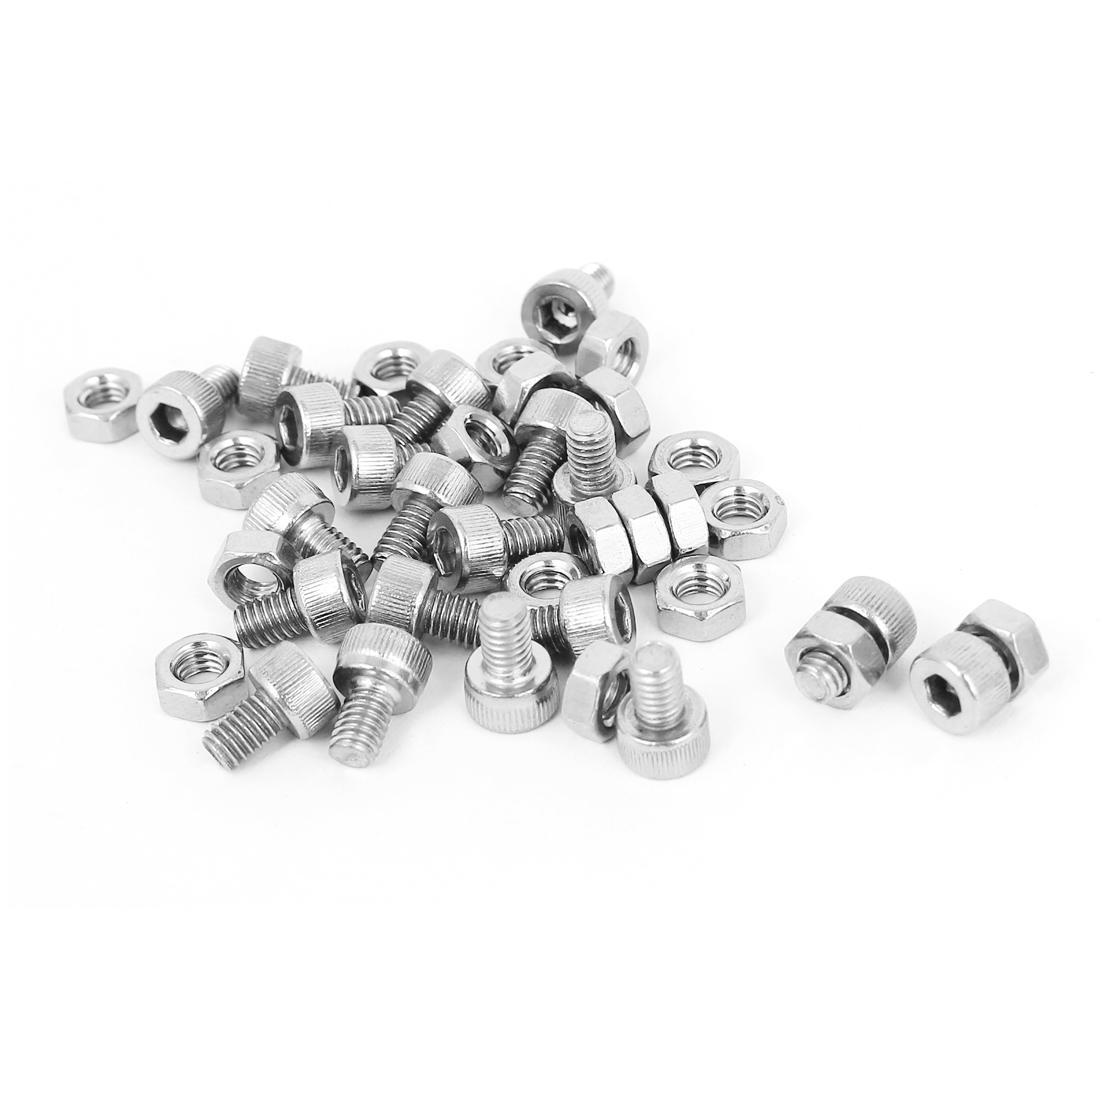 M4x6mm Stainless Steel Hex Socket Head Knurled Cap Screws Bolts Nut Set 20Pcs